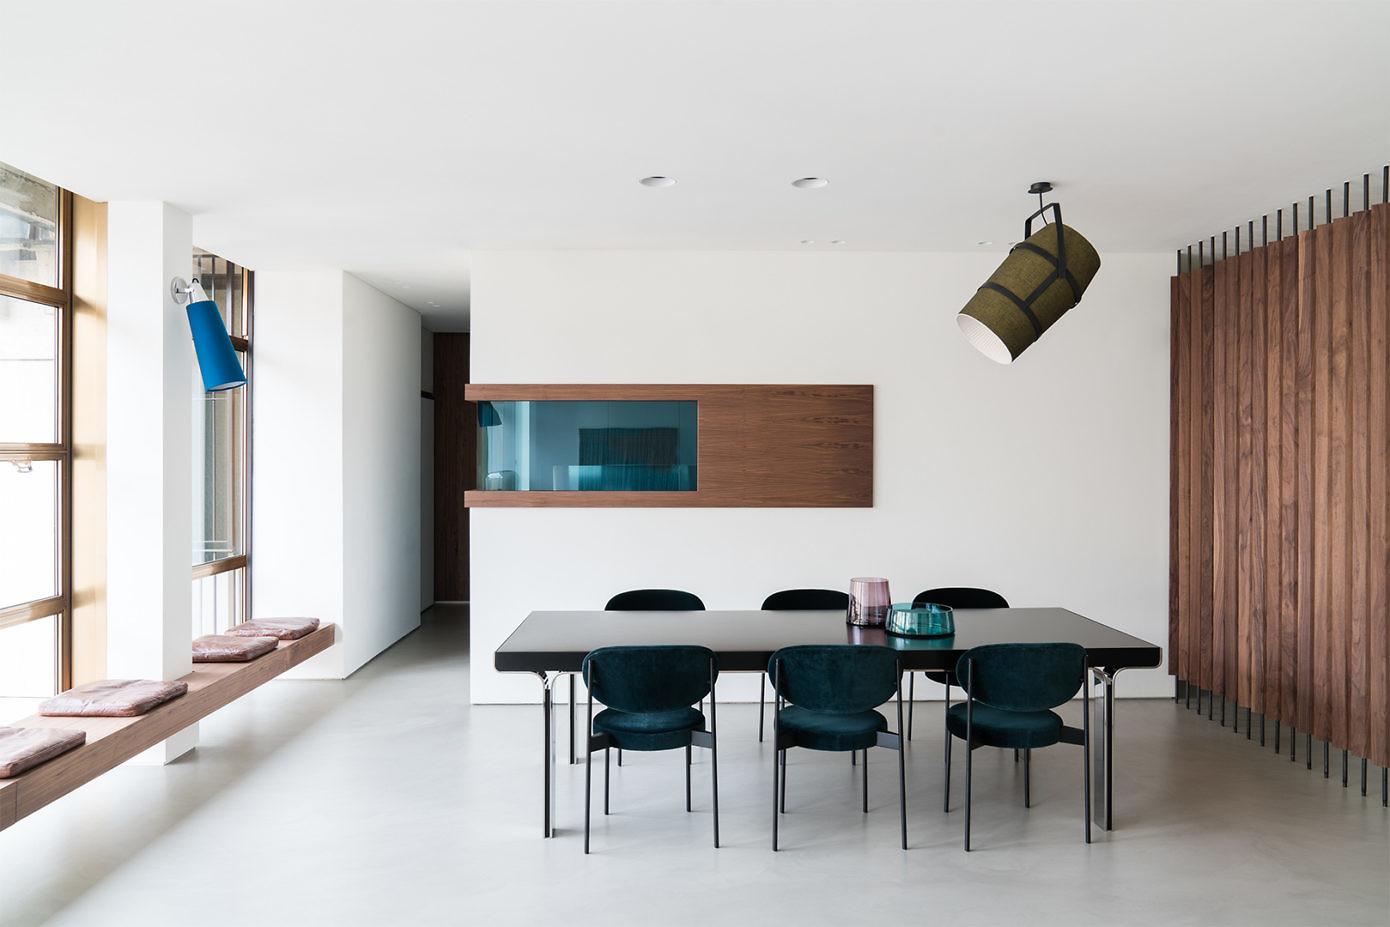 Sette House by Fabio Fantolino